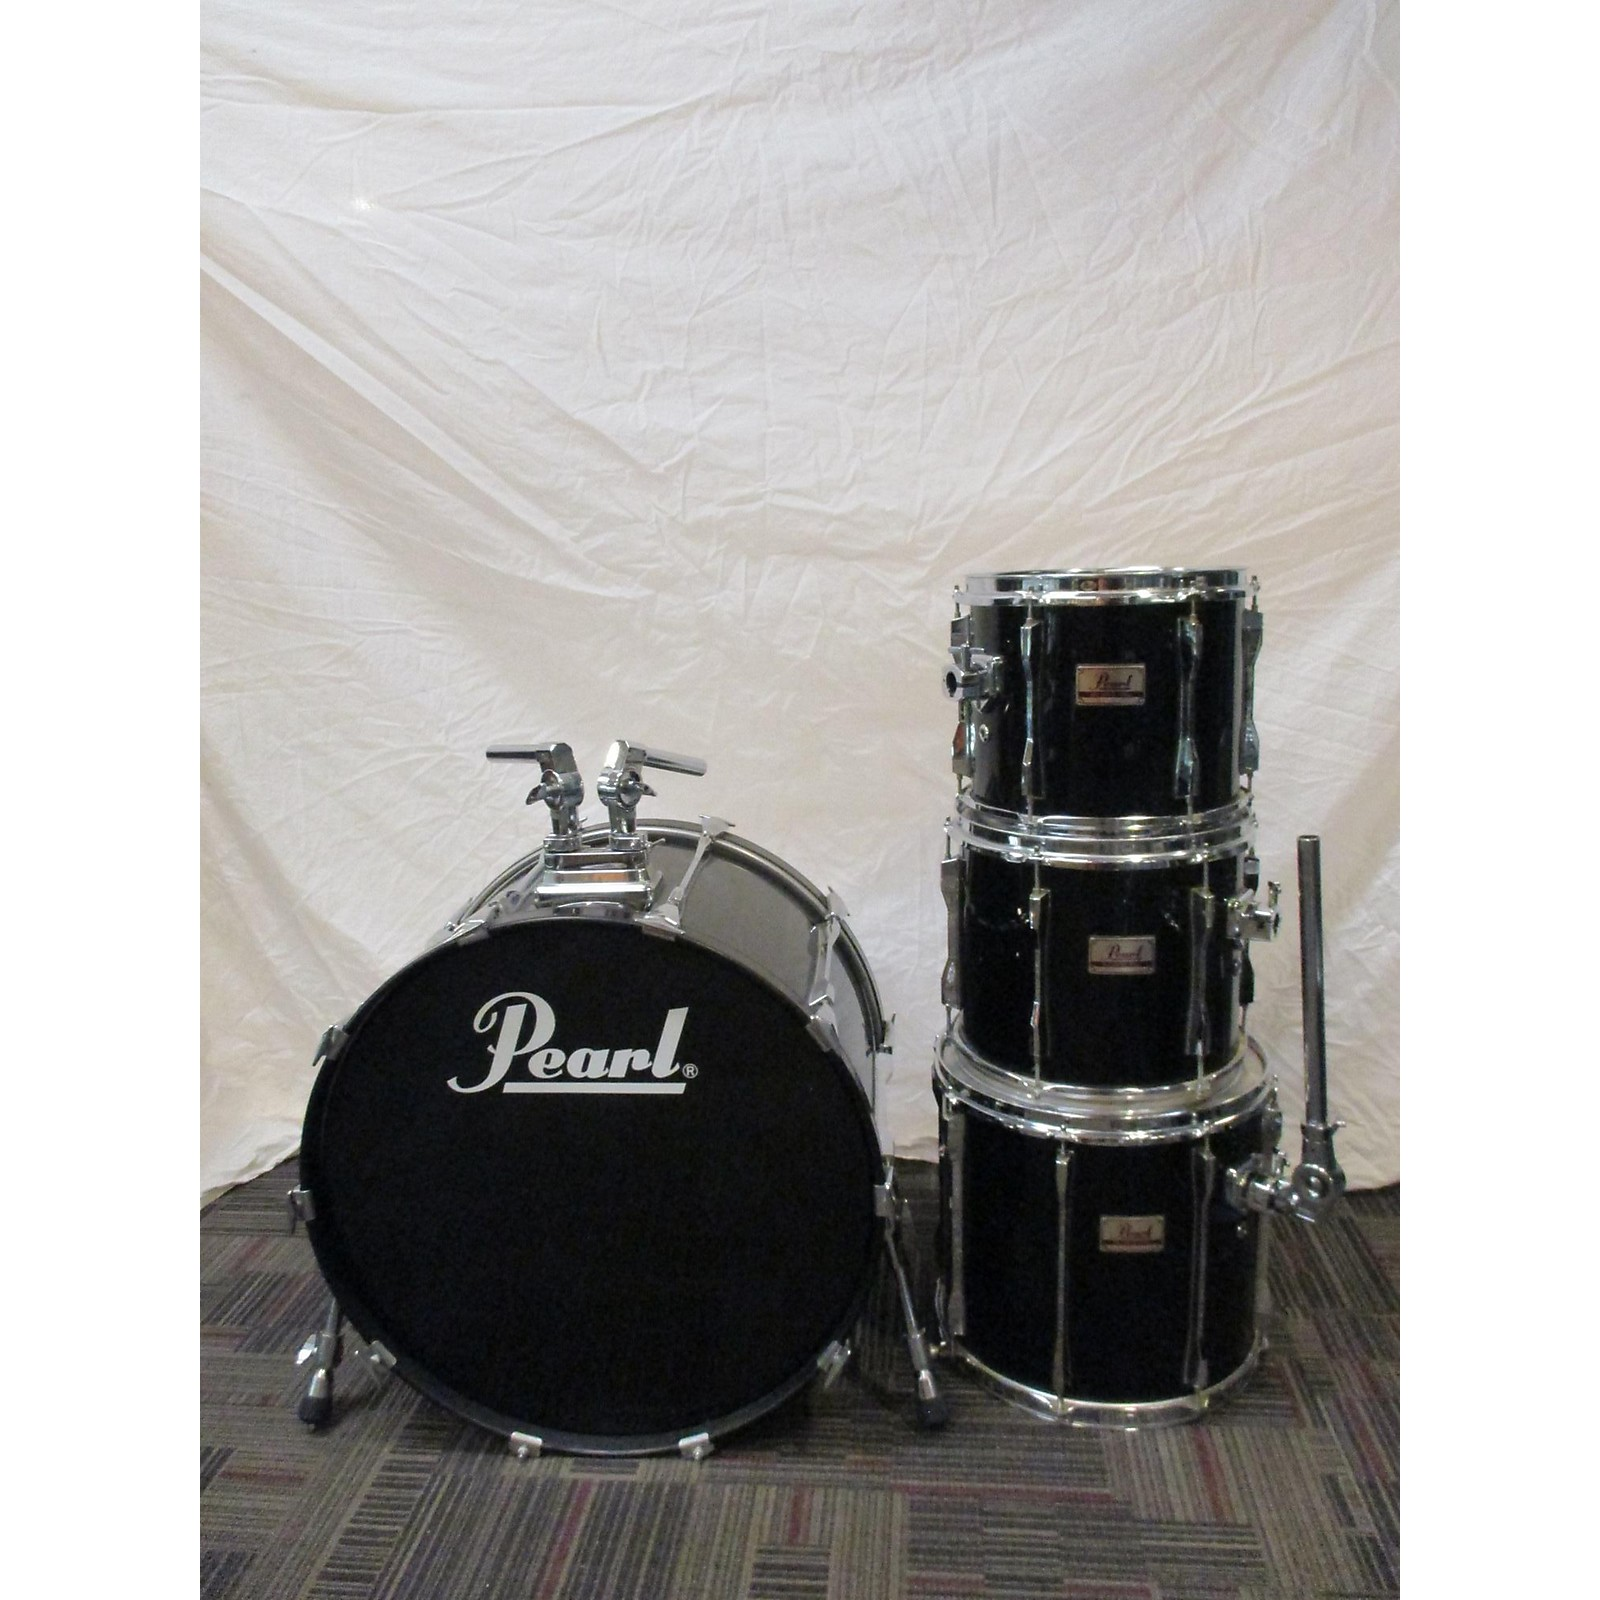 Pearl MLX All Maple Drum Kit